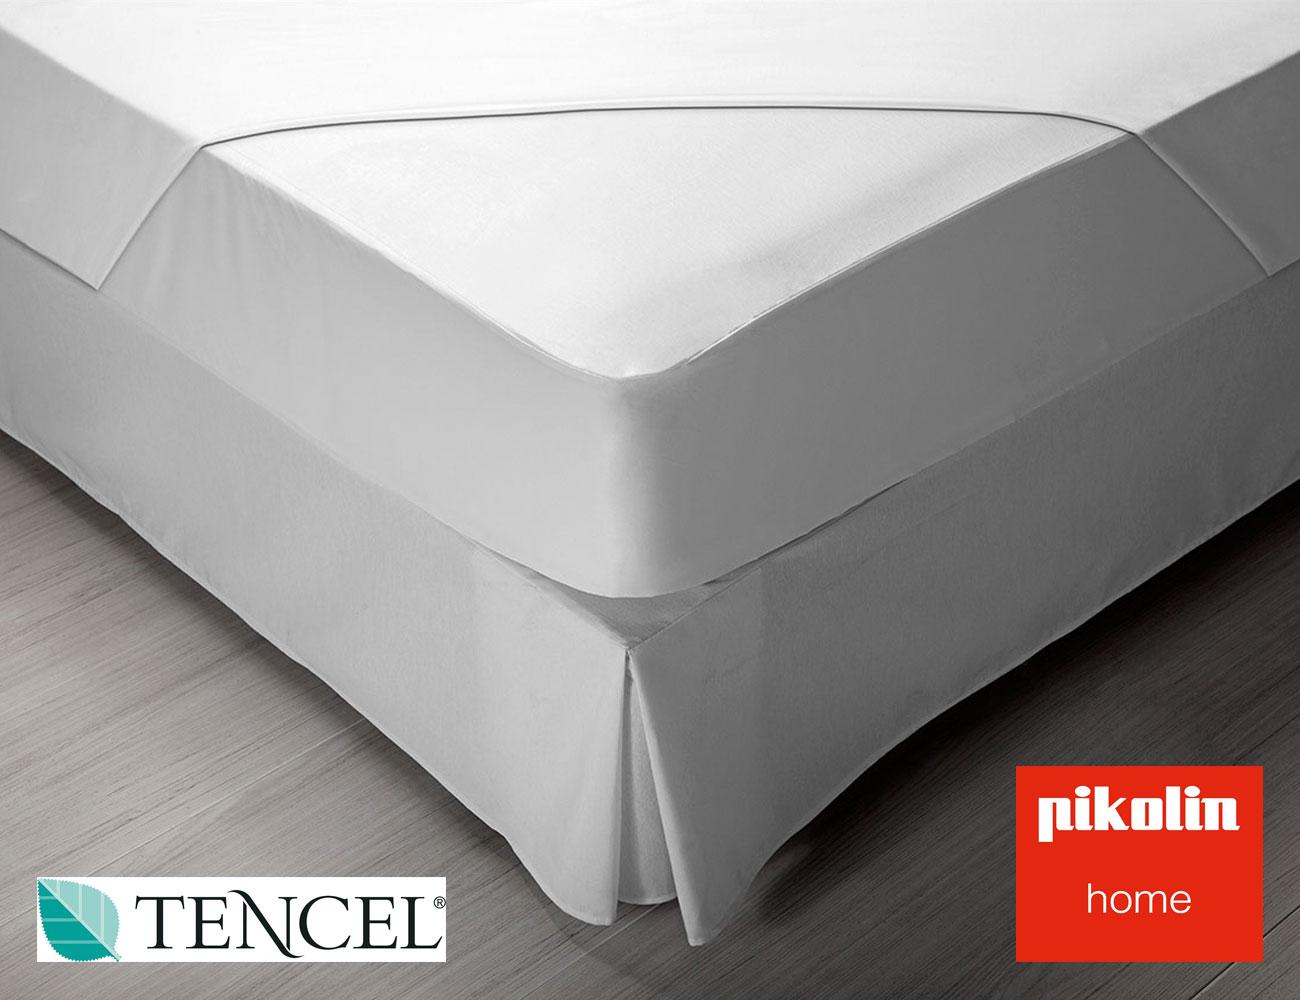 Protector pikolin tencel para colchones hasta 32 cm altura 18045 factory del mueble utrera - Protector de colchones impermeables ...